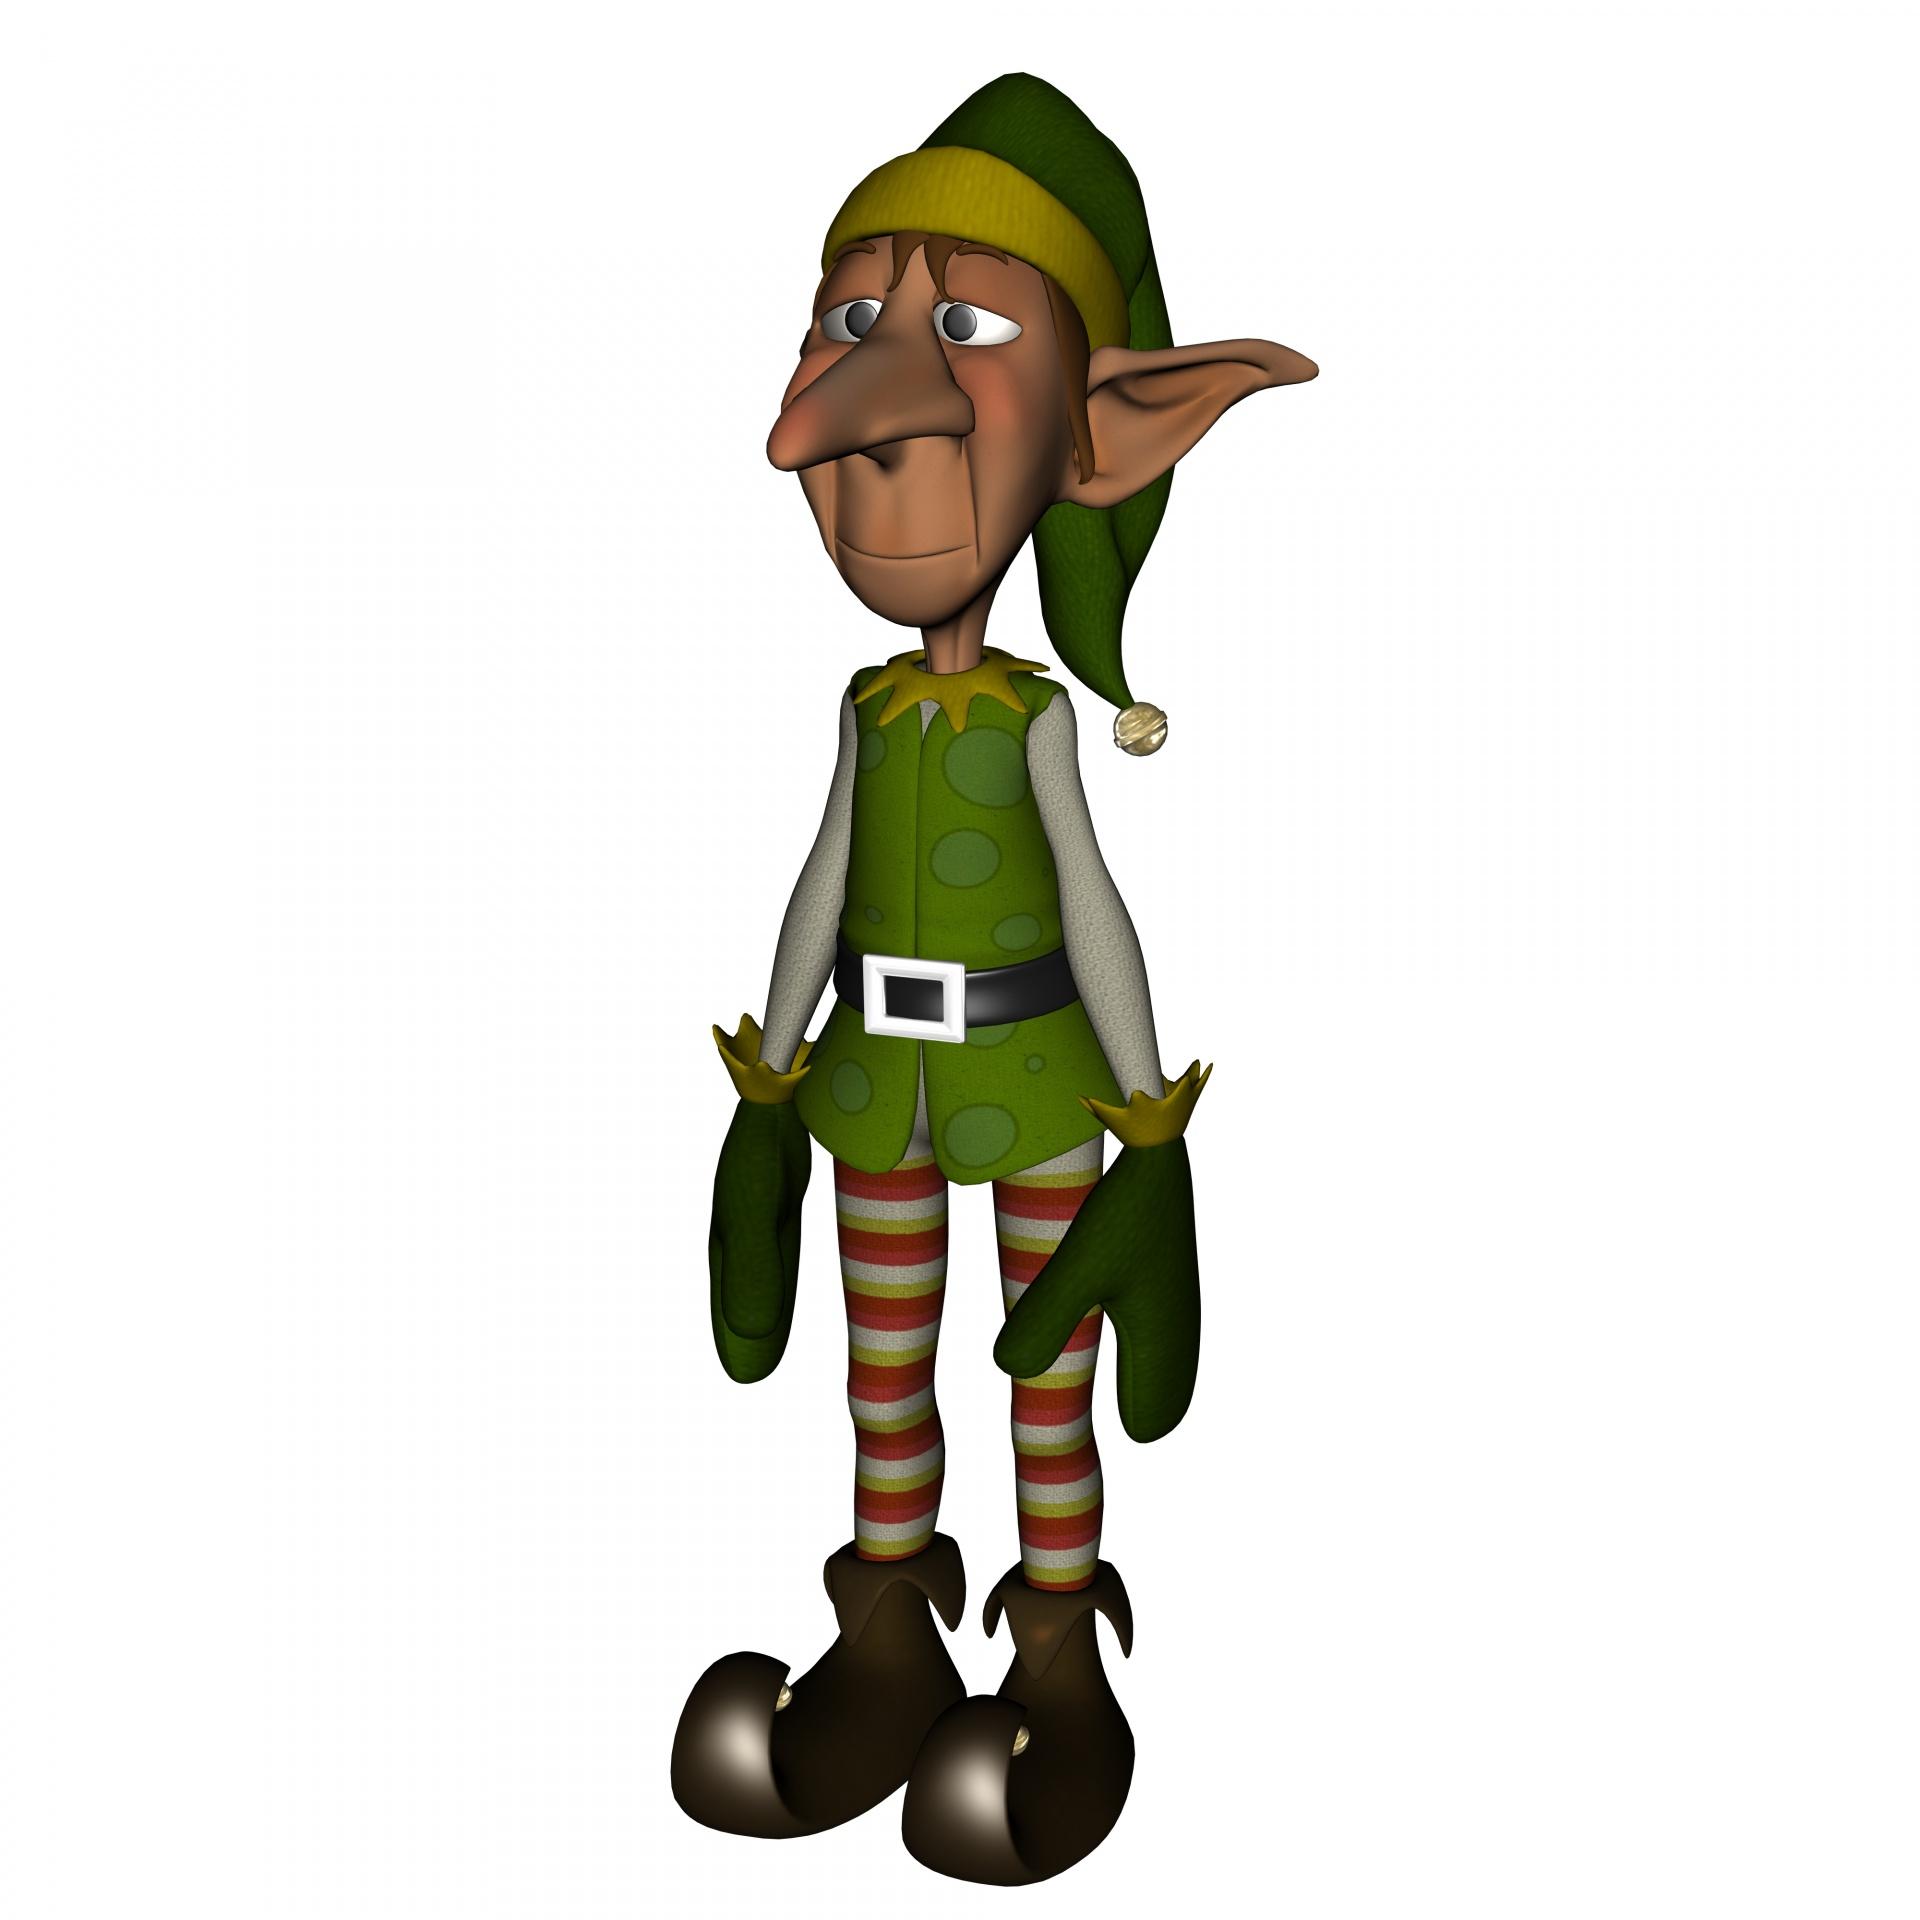 Xmas Elf Free Stock Photo